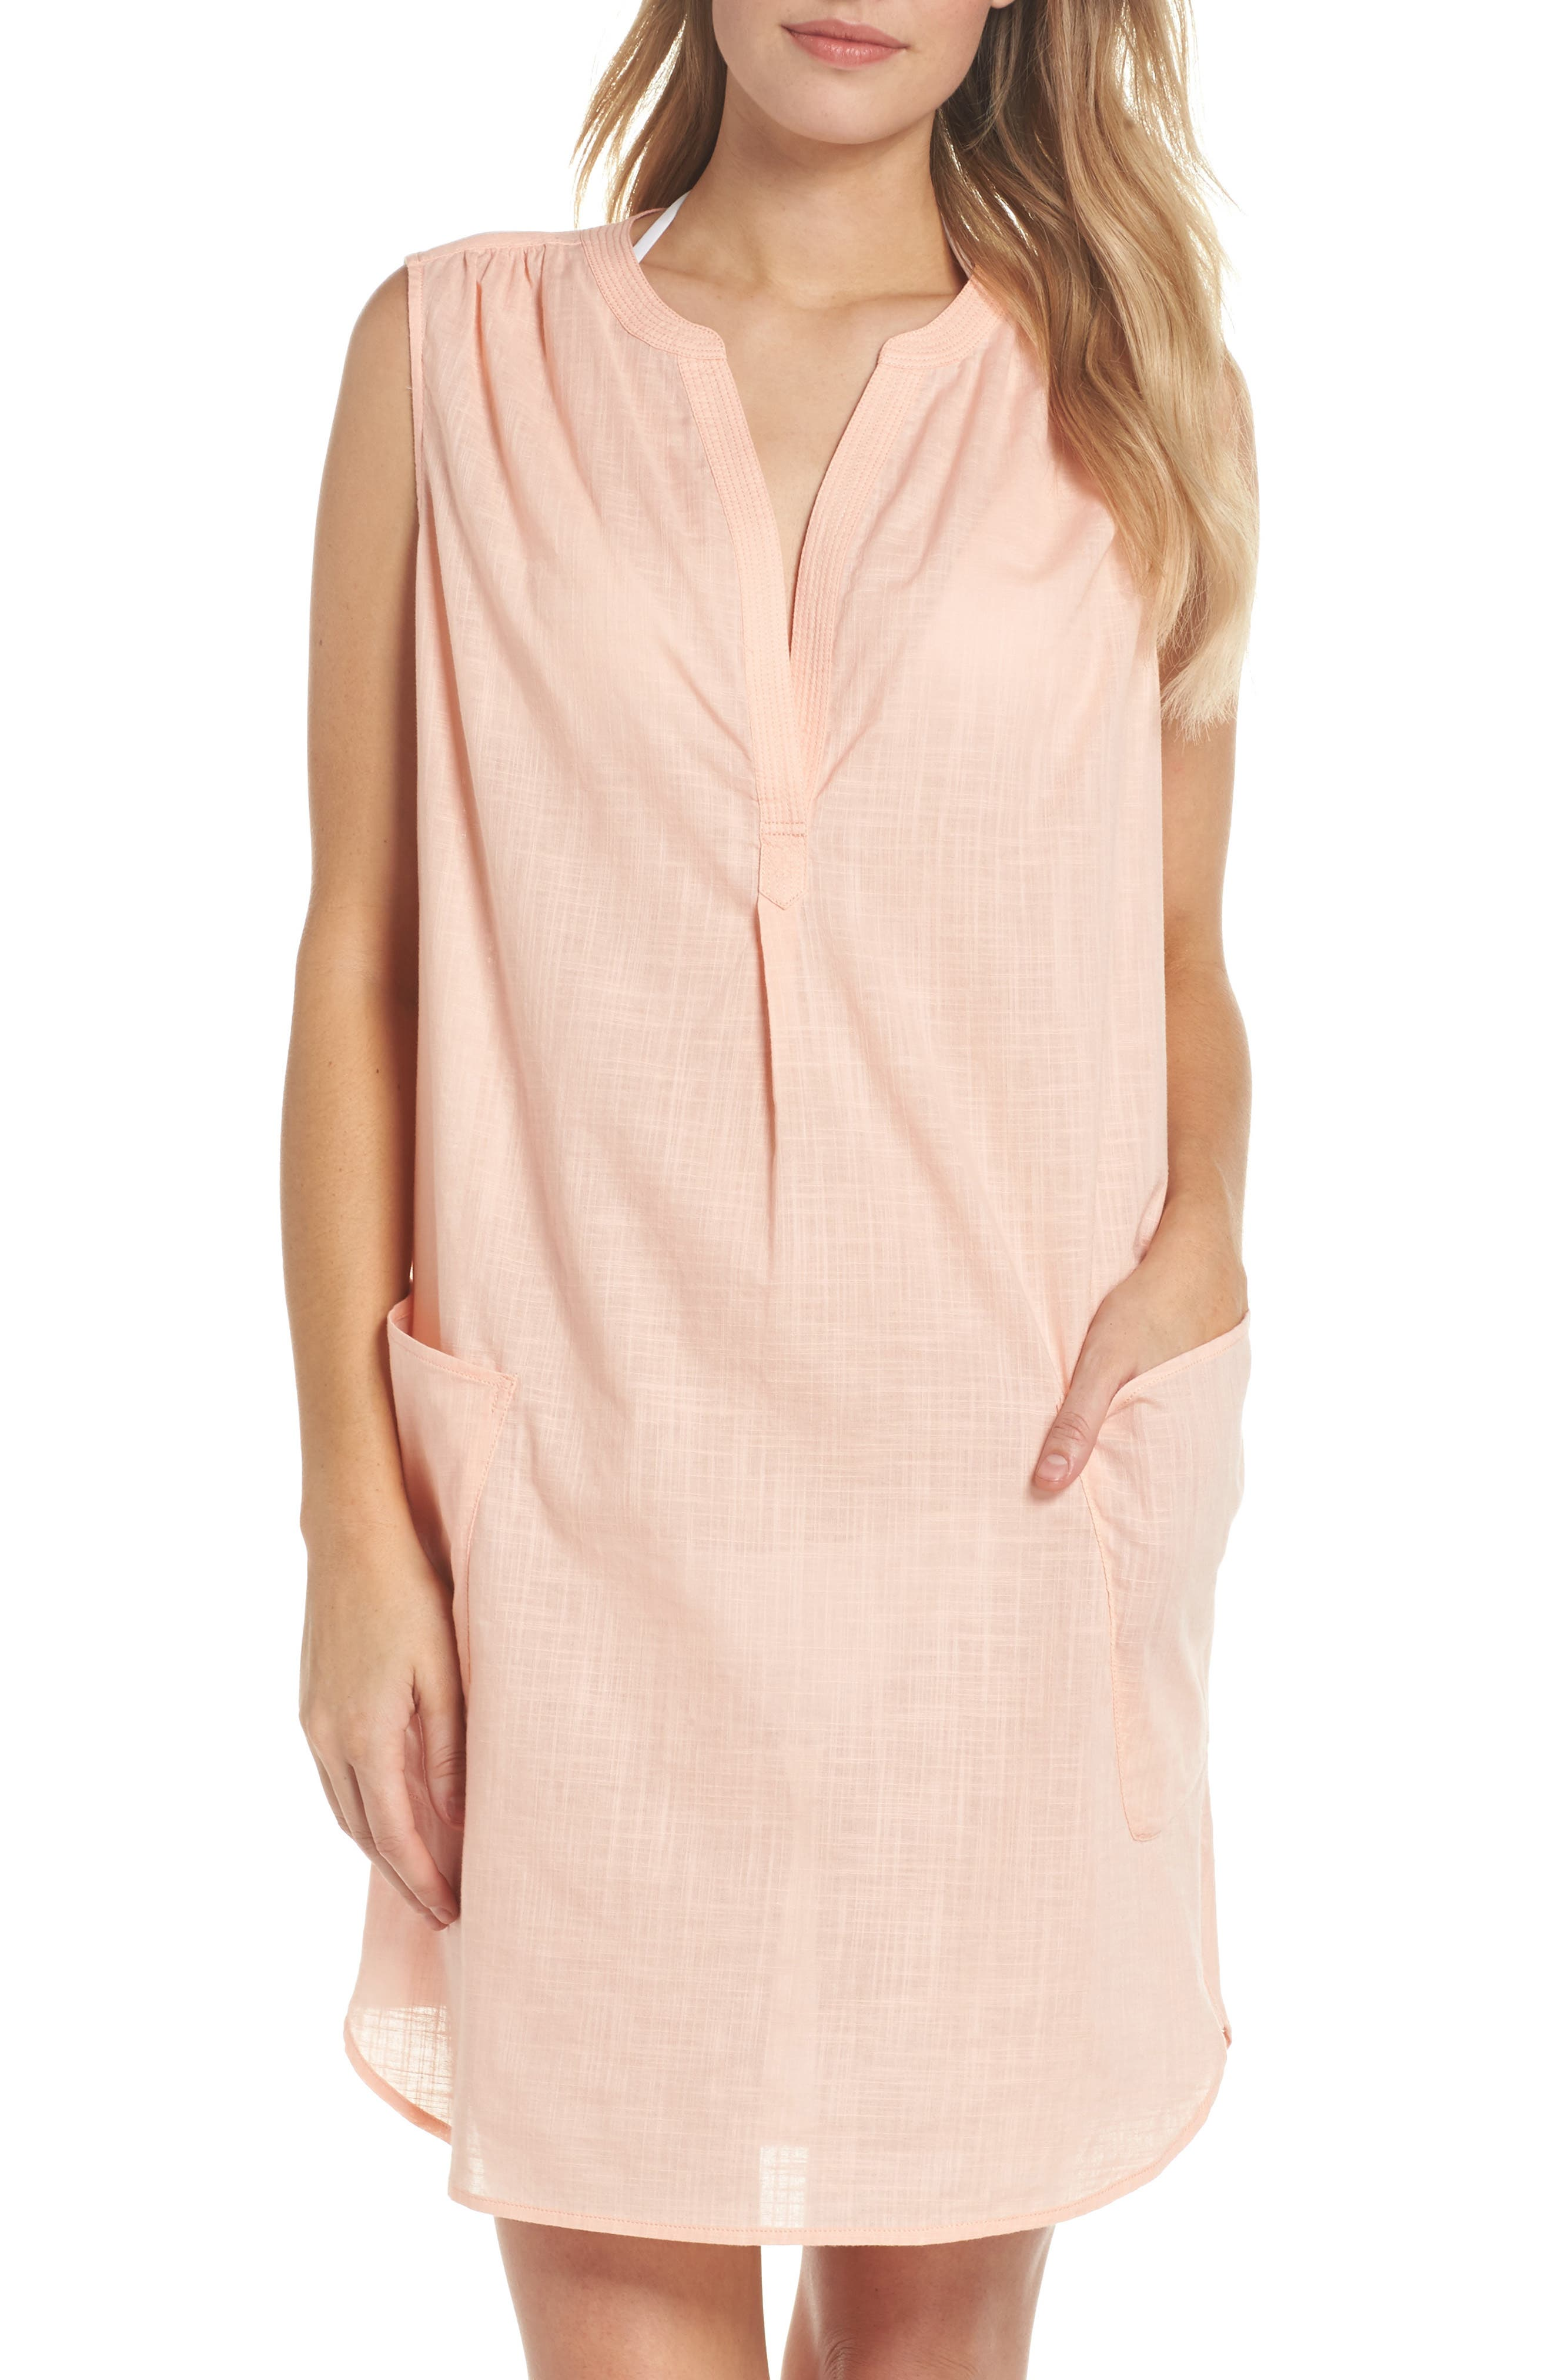 Palm Beach Cover-Up Dress,                         Main,                         color, Peach Melba